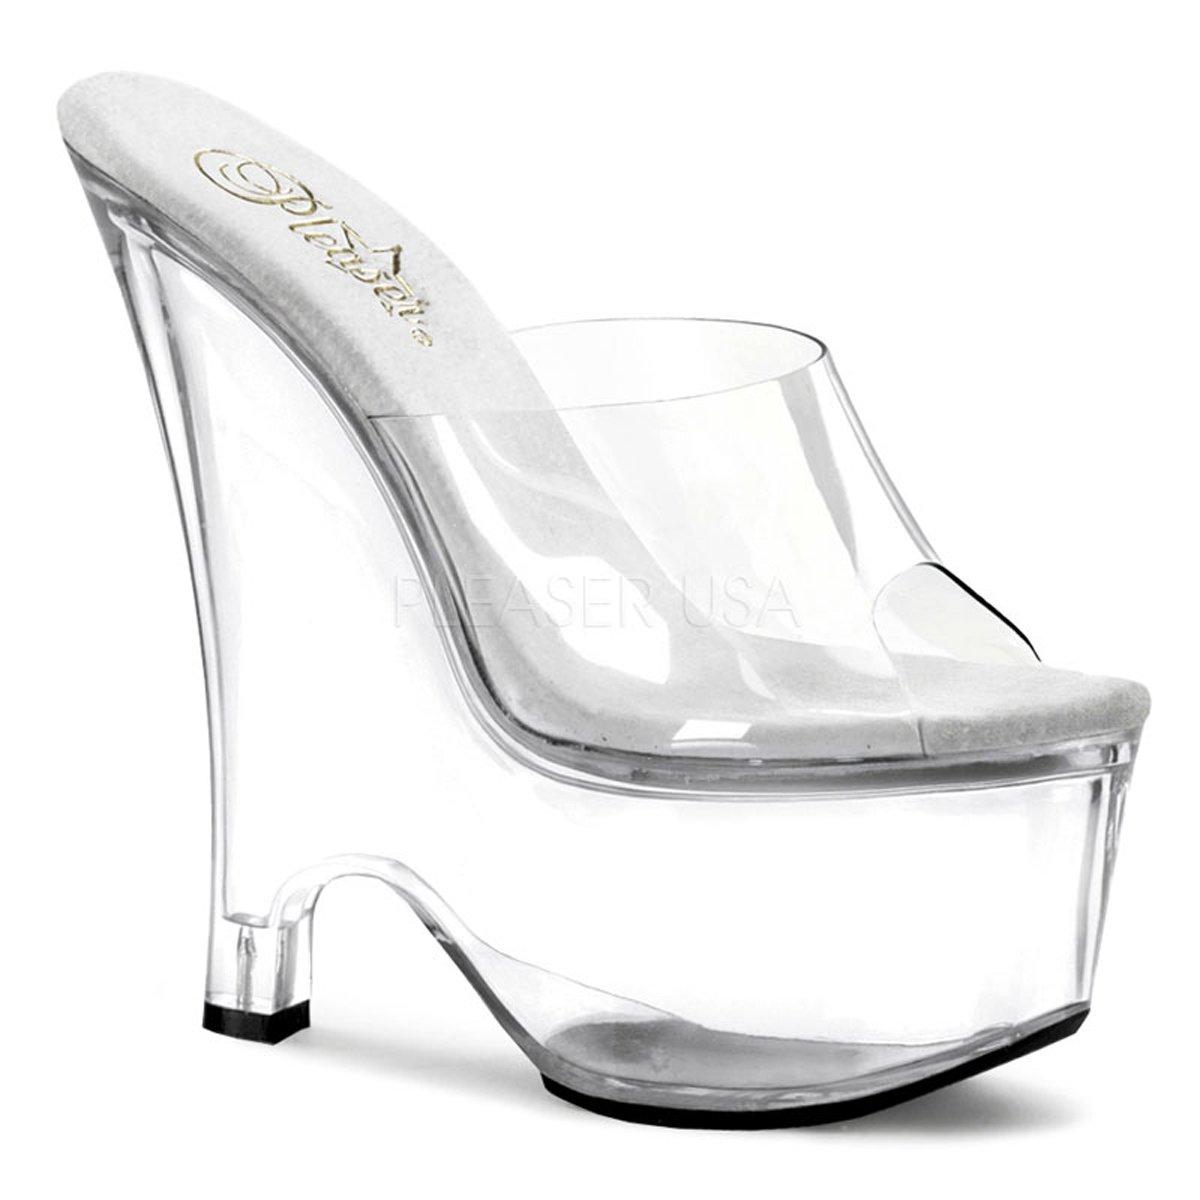 Pleaser Beau-601 Women's Wedge Heel Slip on 6.1/2 Hot Sexy Sandal. B06VX4V6FH 5 B(M) US Clear/Clear